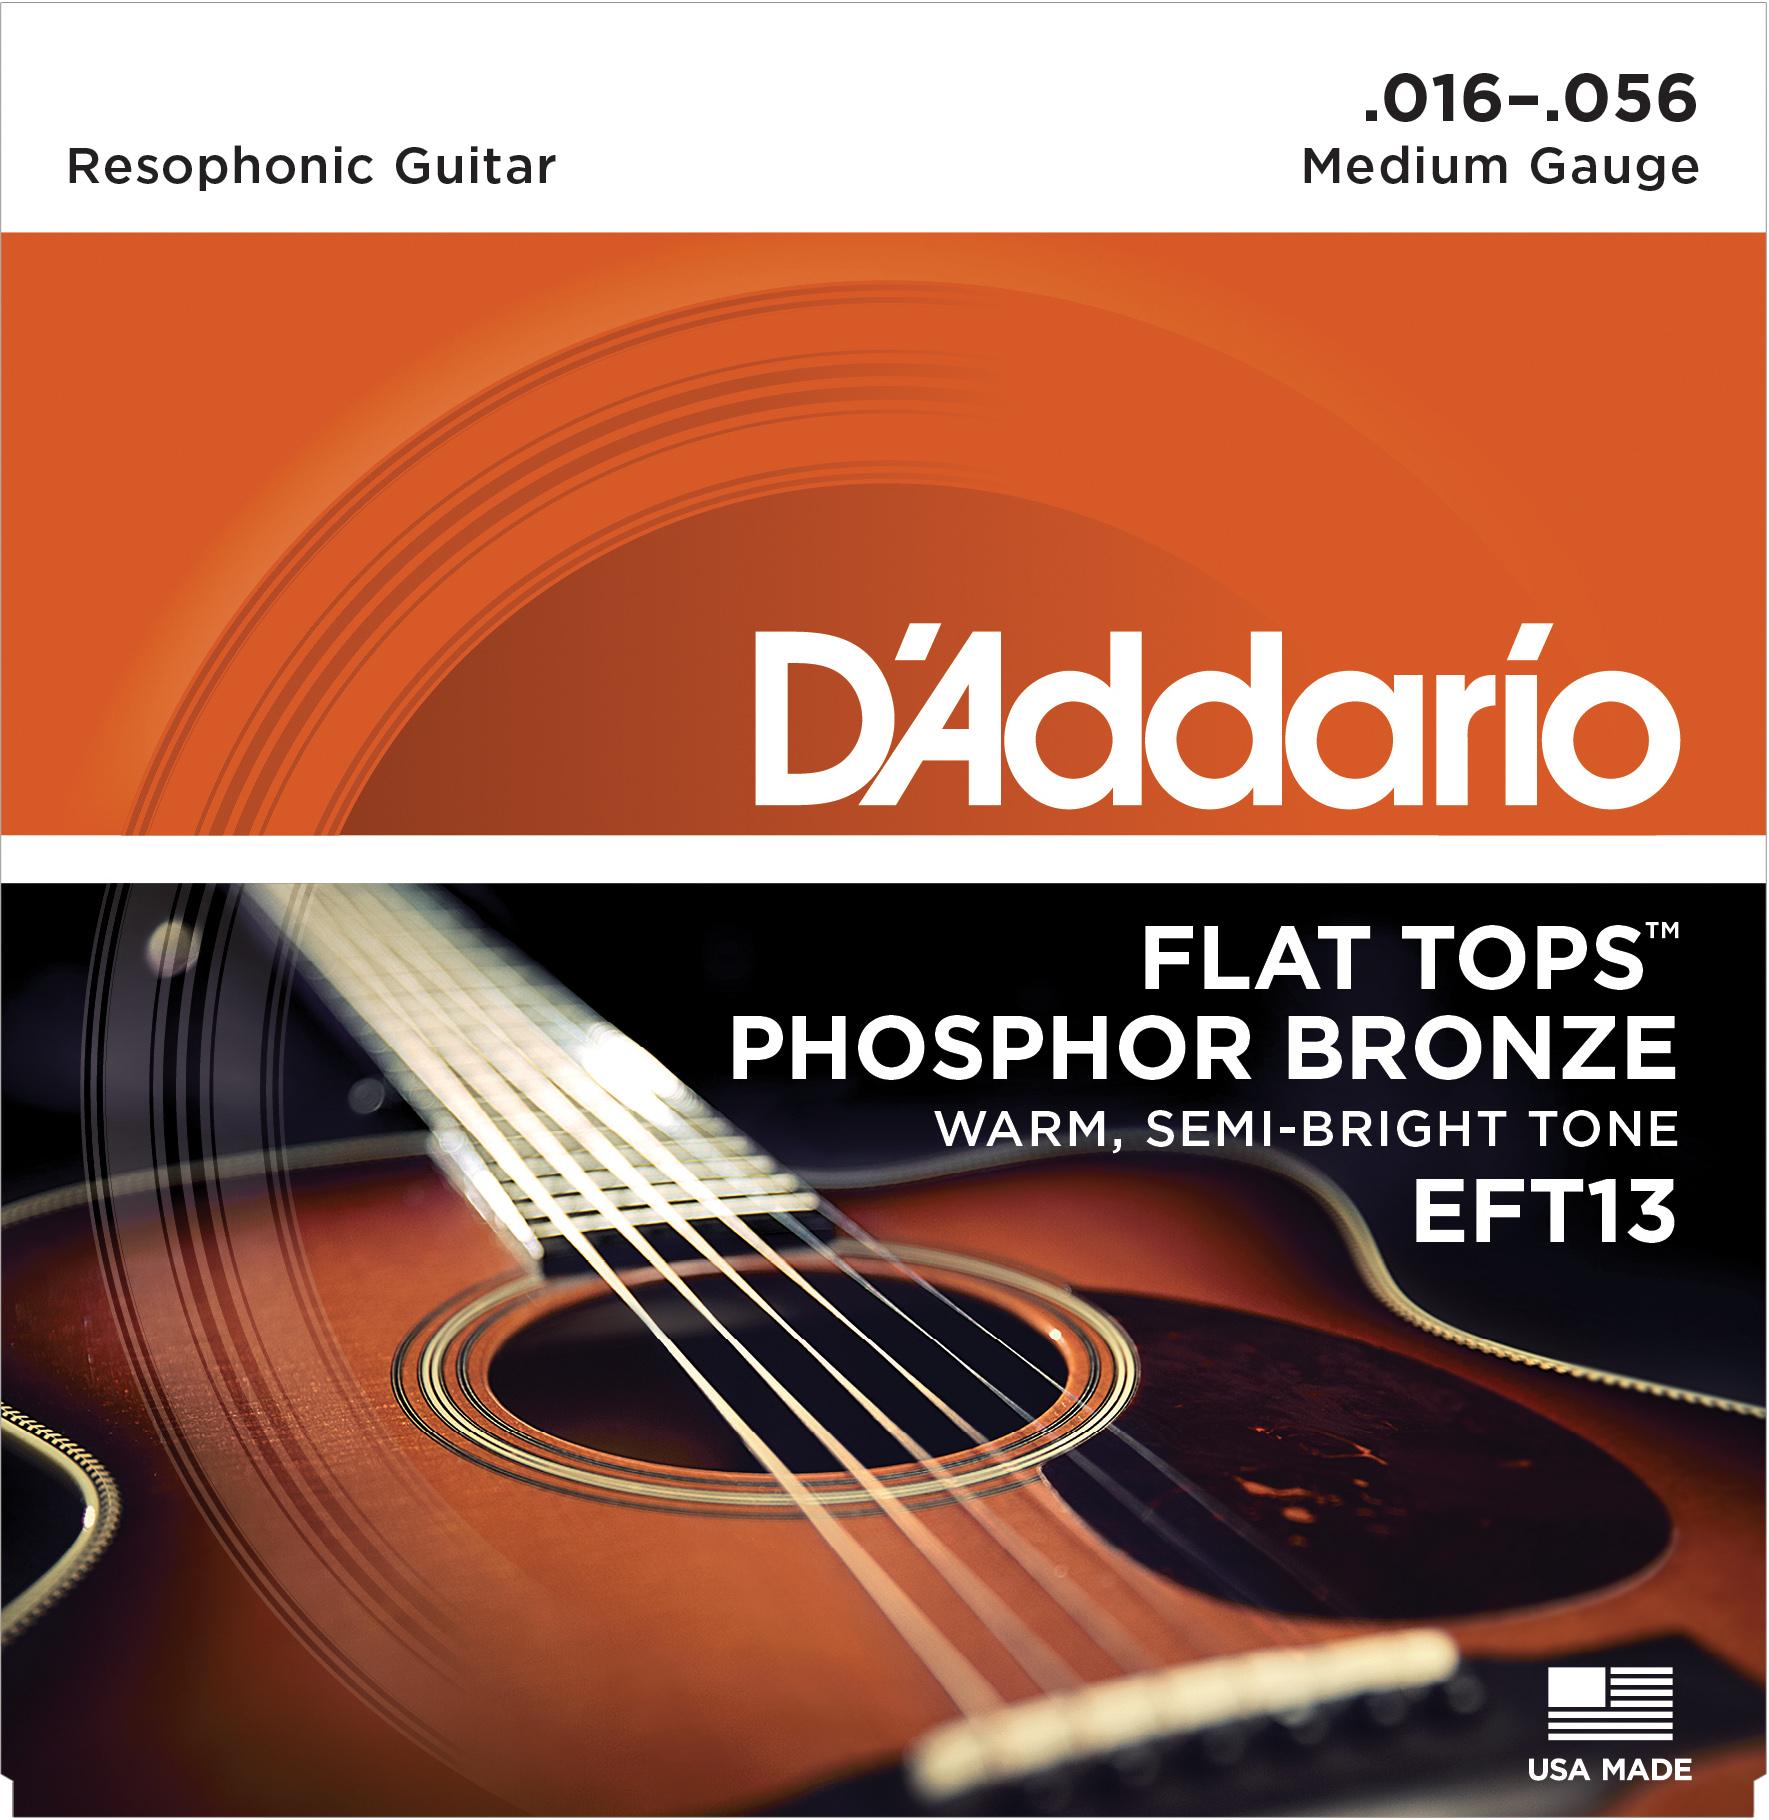 D'Addario EFT13 Flat Tops Phosphor Bronze Acoustic Guitar Strings, Resophonic Gu...